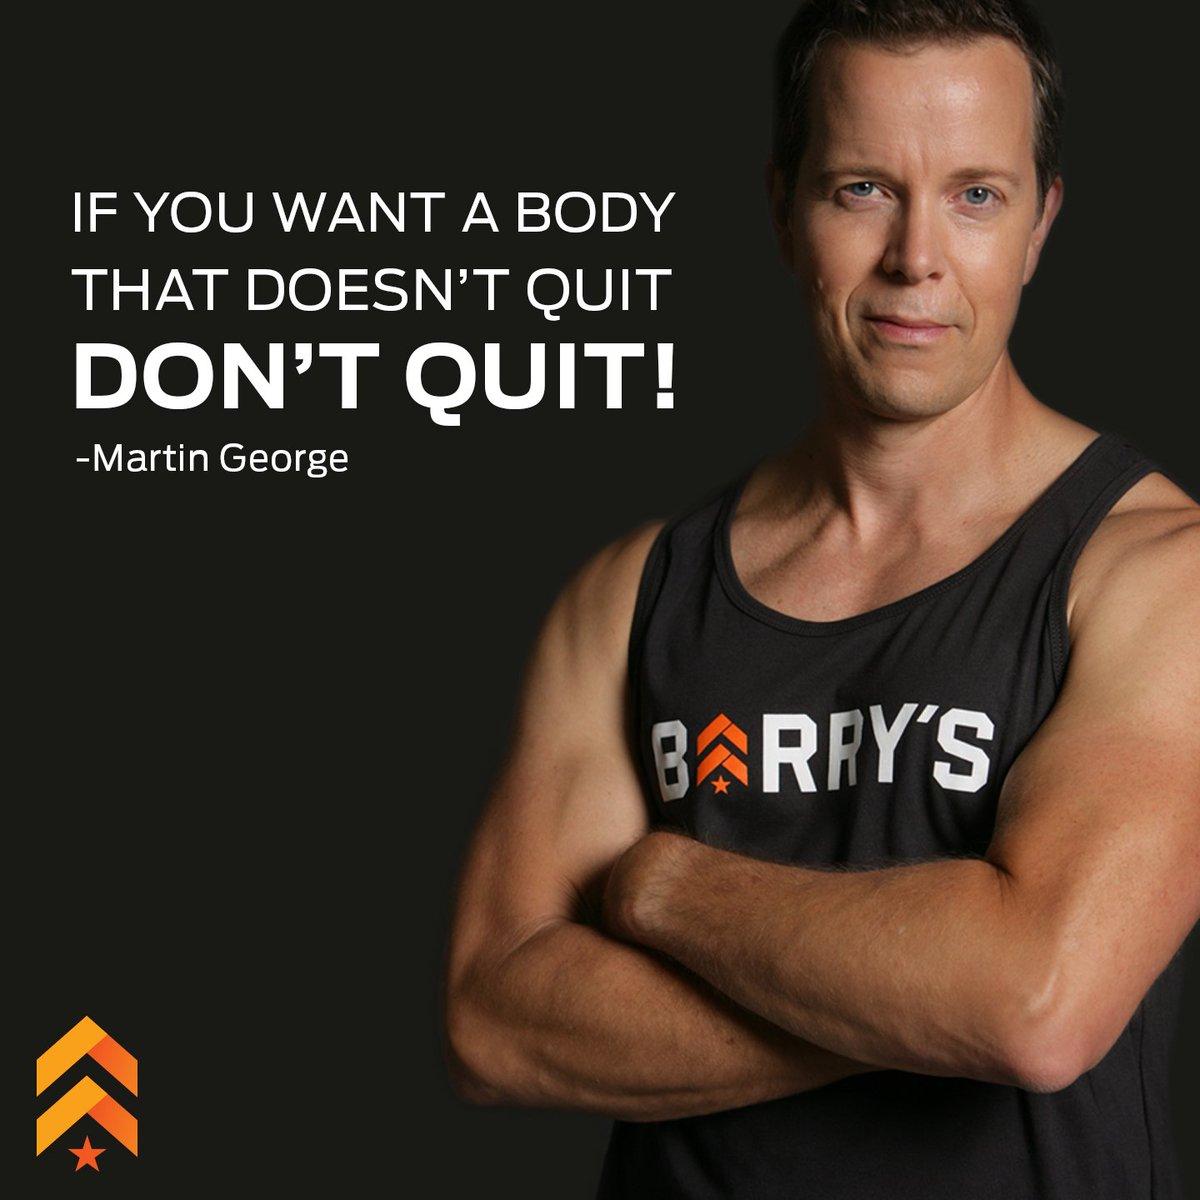 RT : #motivationmonday #mondaymotivation 2cyrXUmhvs